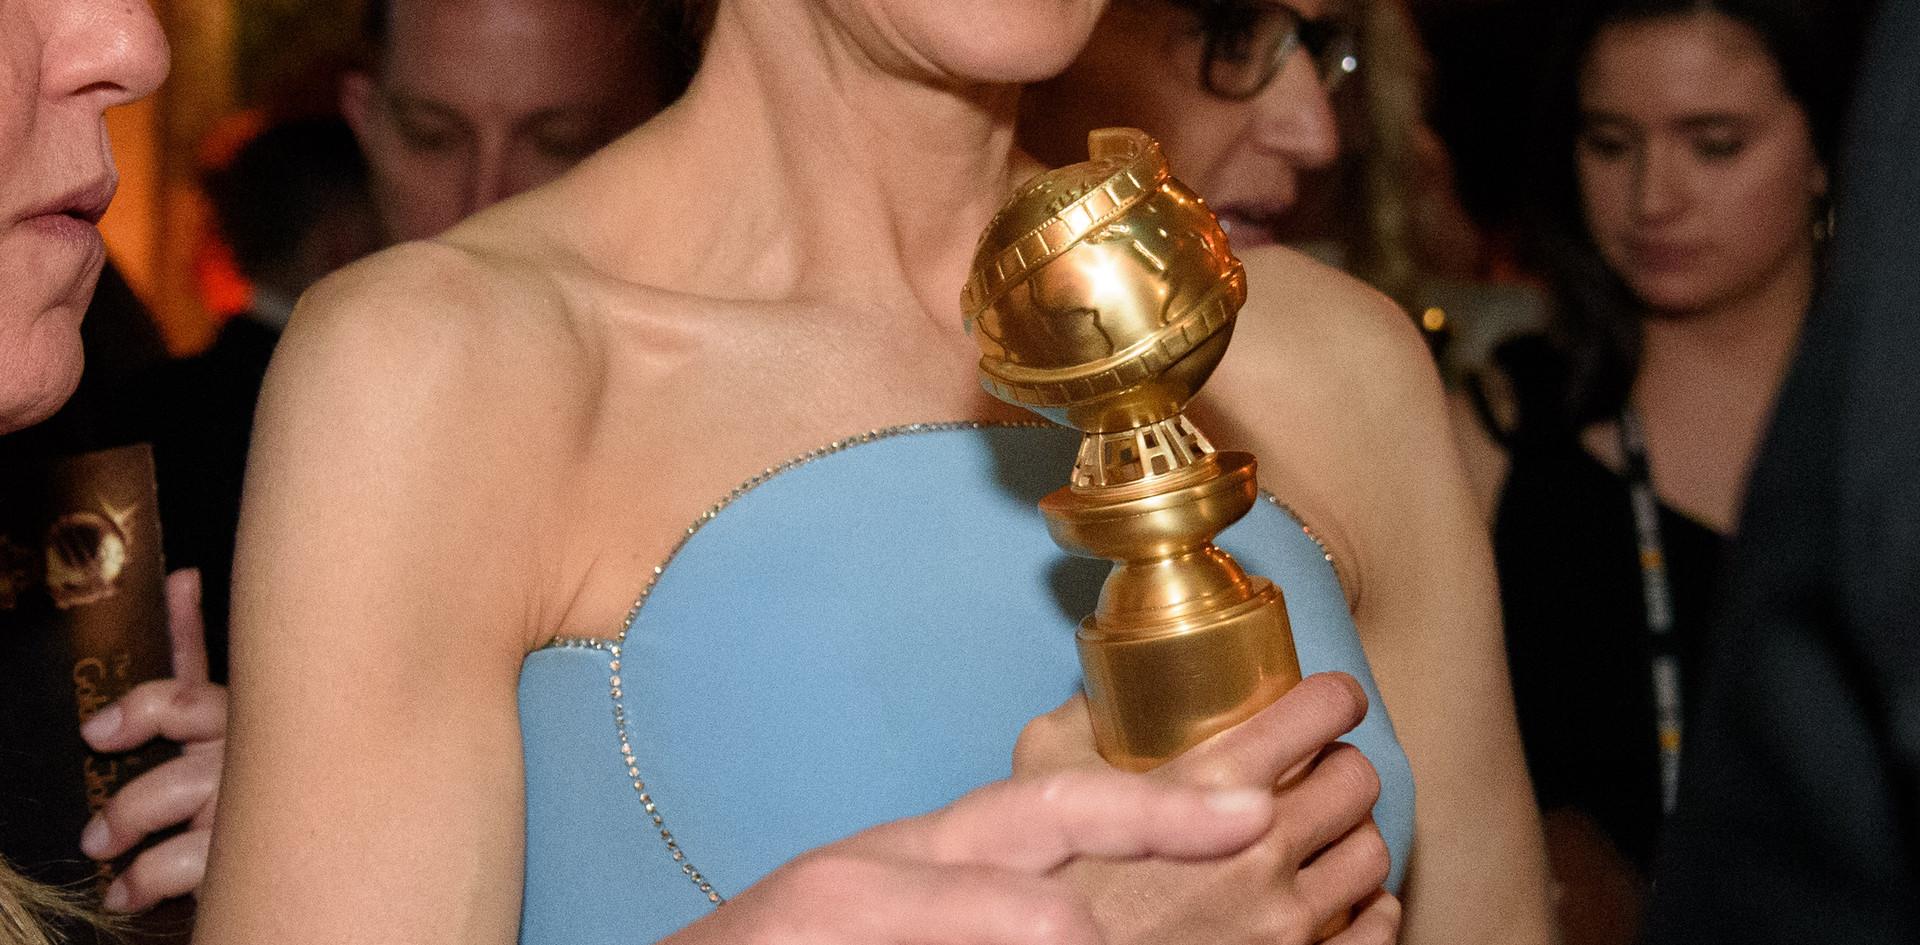 Renee Zellweger na Sala do After Party Media (Festa depois da Entrega dos Golden Globes) do 76th Annual Golden Globes Awards no Beverly Hilton em Beverly Hills, CA. Photographer: HFPA Photographer.